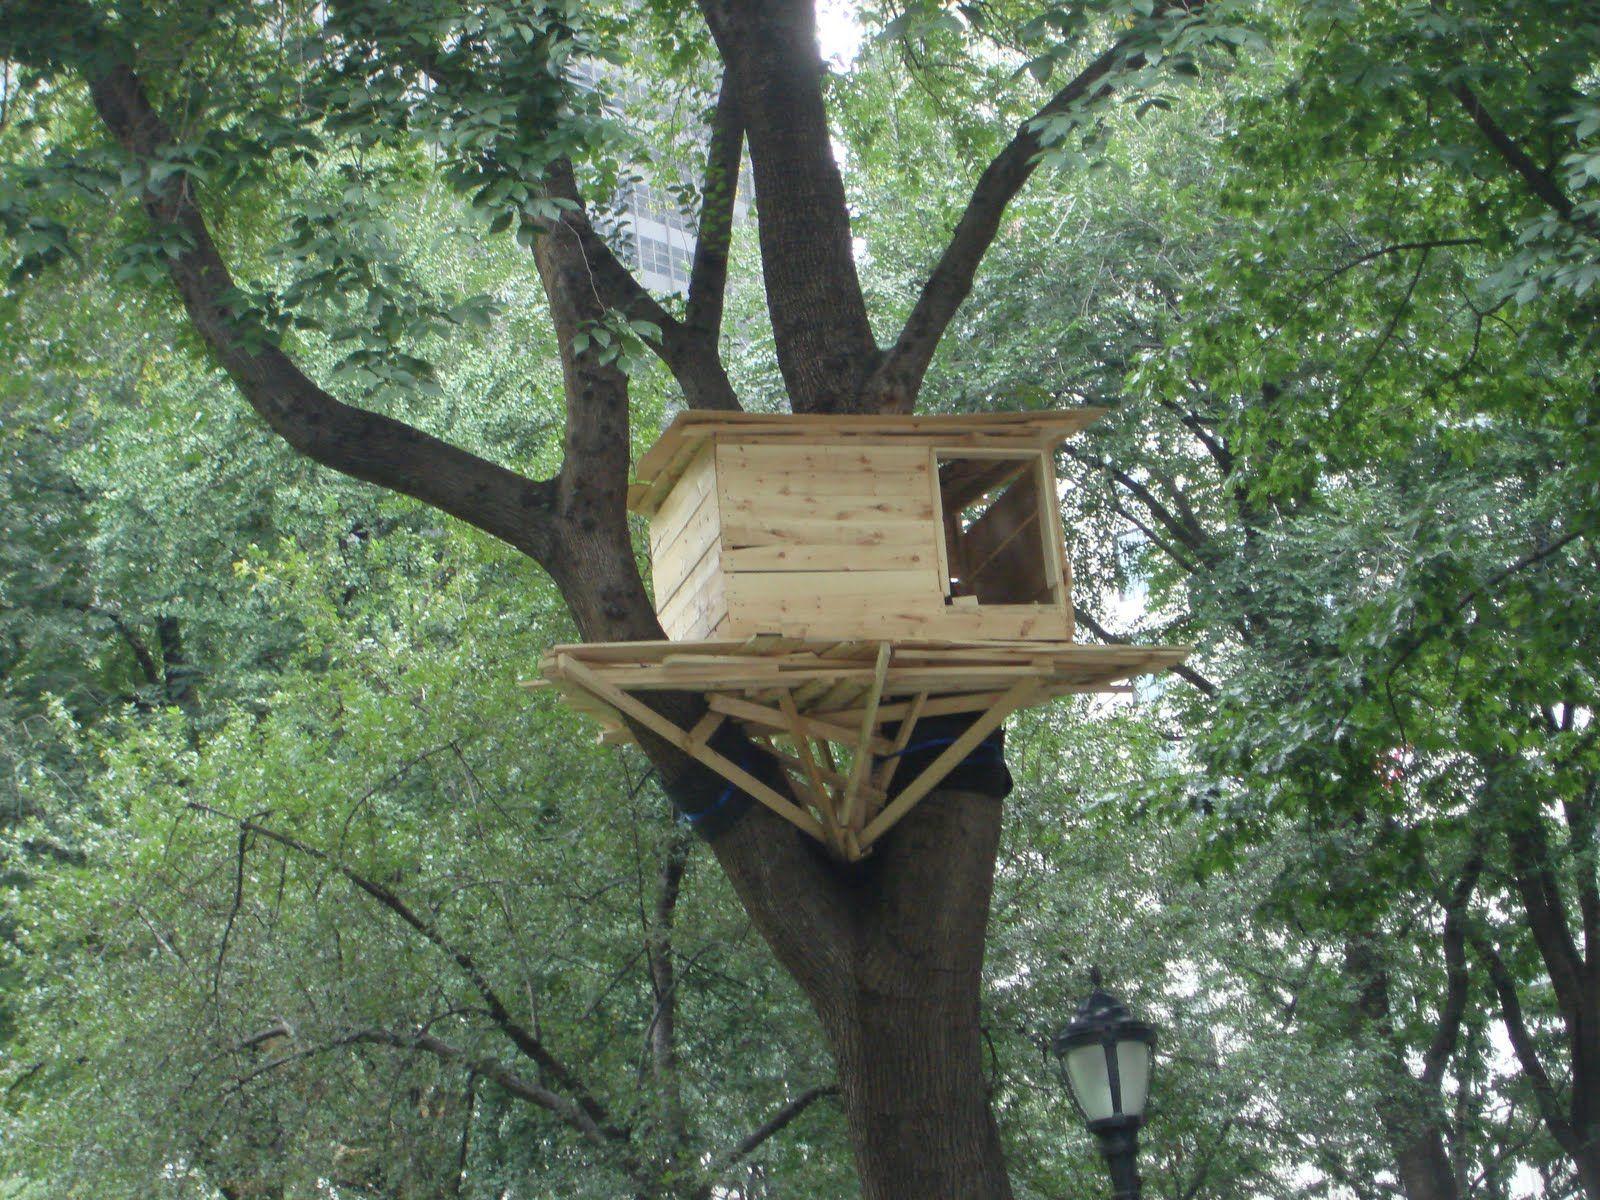 Small tree house blueprints Slide Tree House Ideas treehouse Pinterest 21 Best Diy Tree House Design Ideas For Child Adult Pinterest